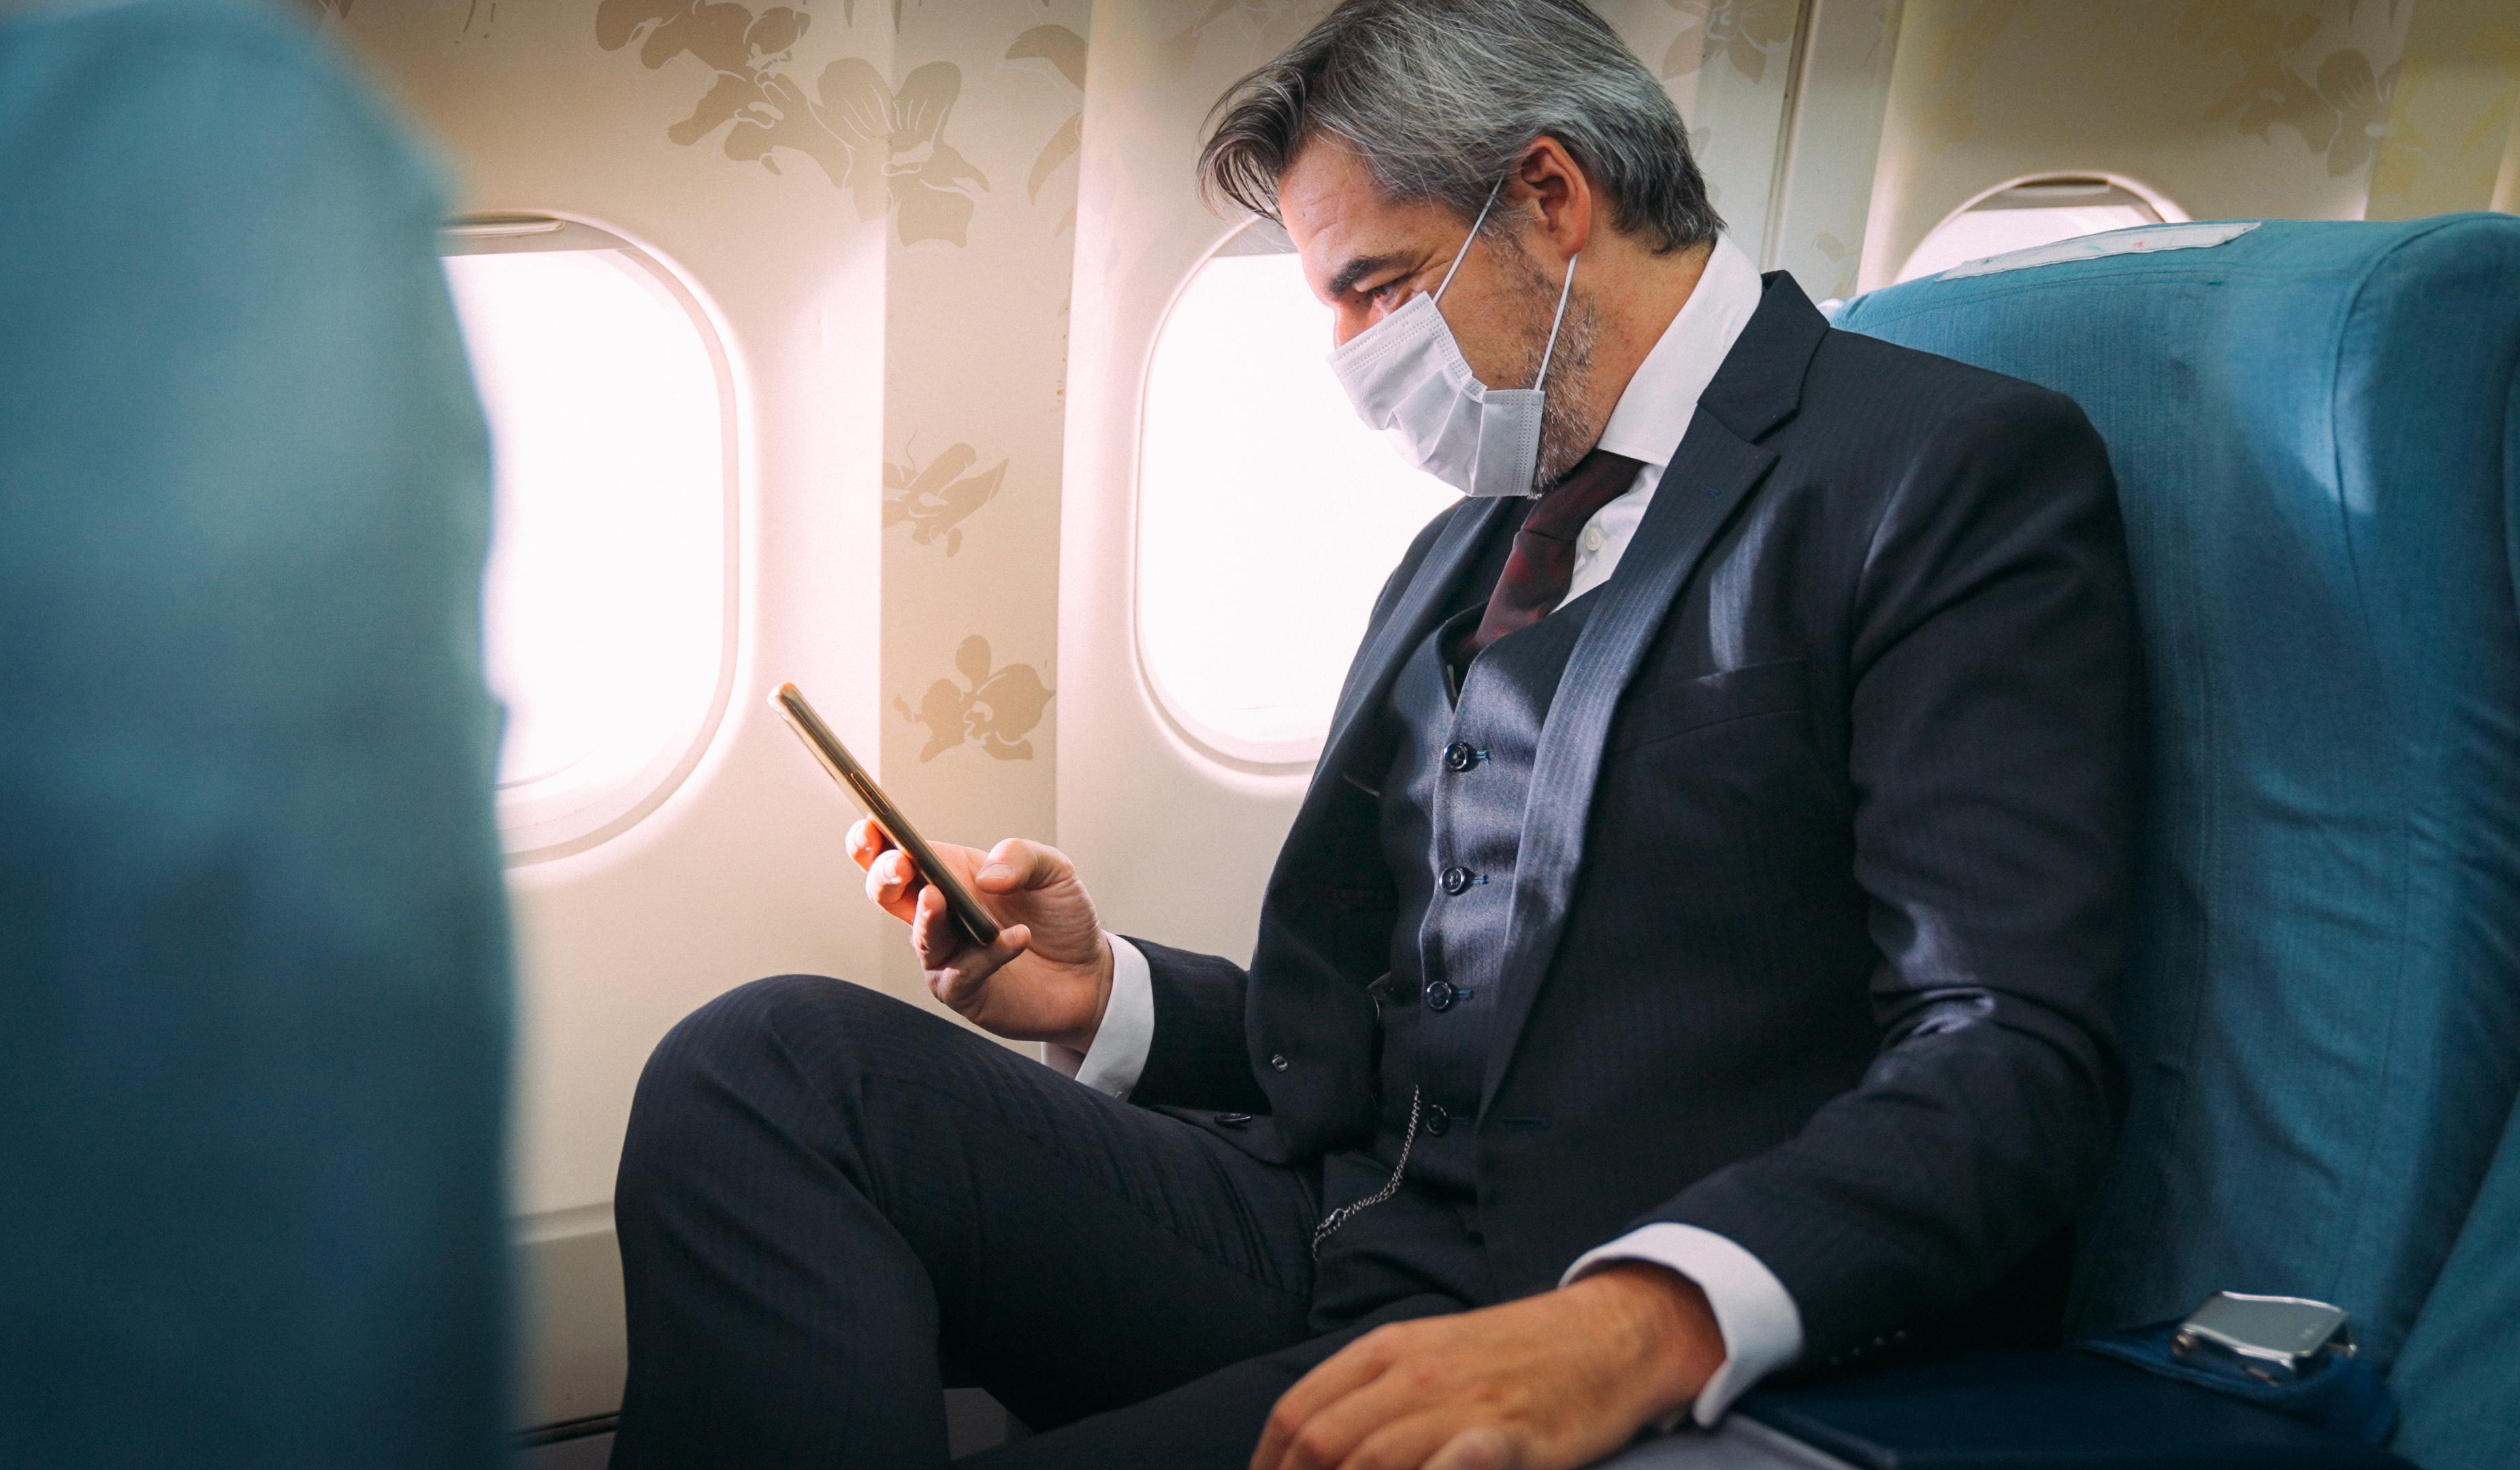 Un hombre en un avión usando mascarilla